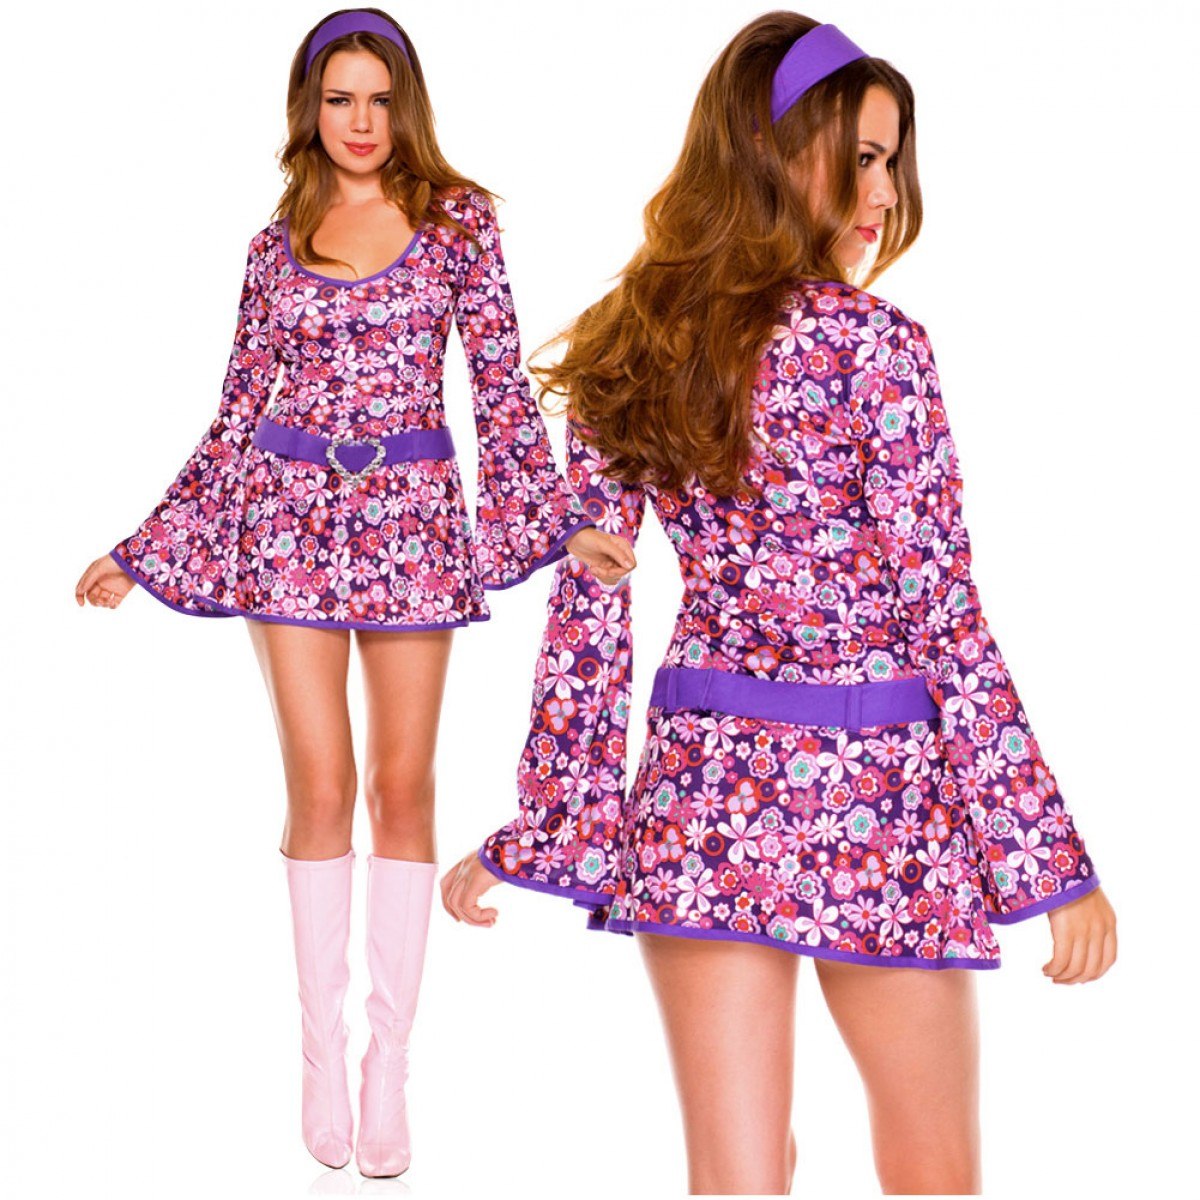 70s Style Dresses Www Pixshark Com Images Galleries